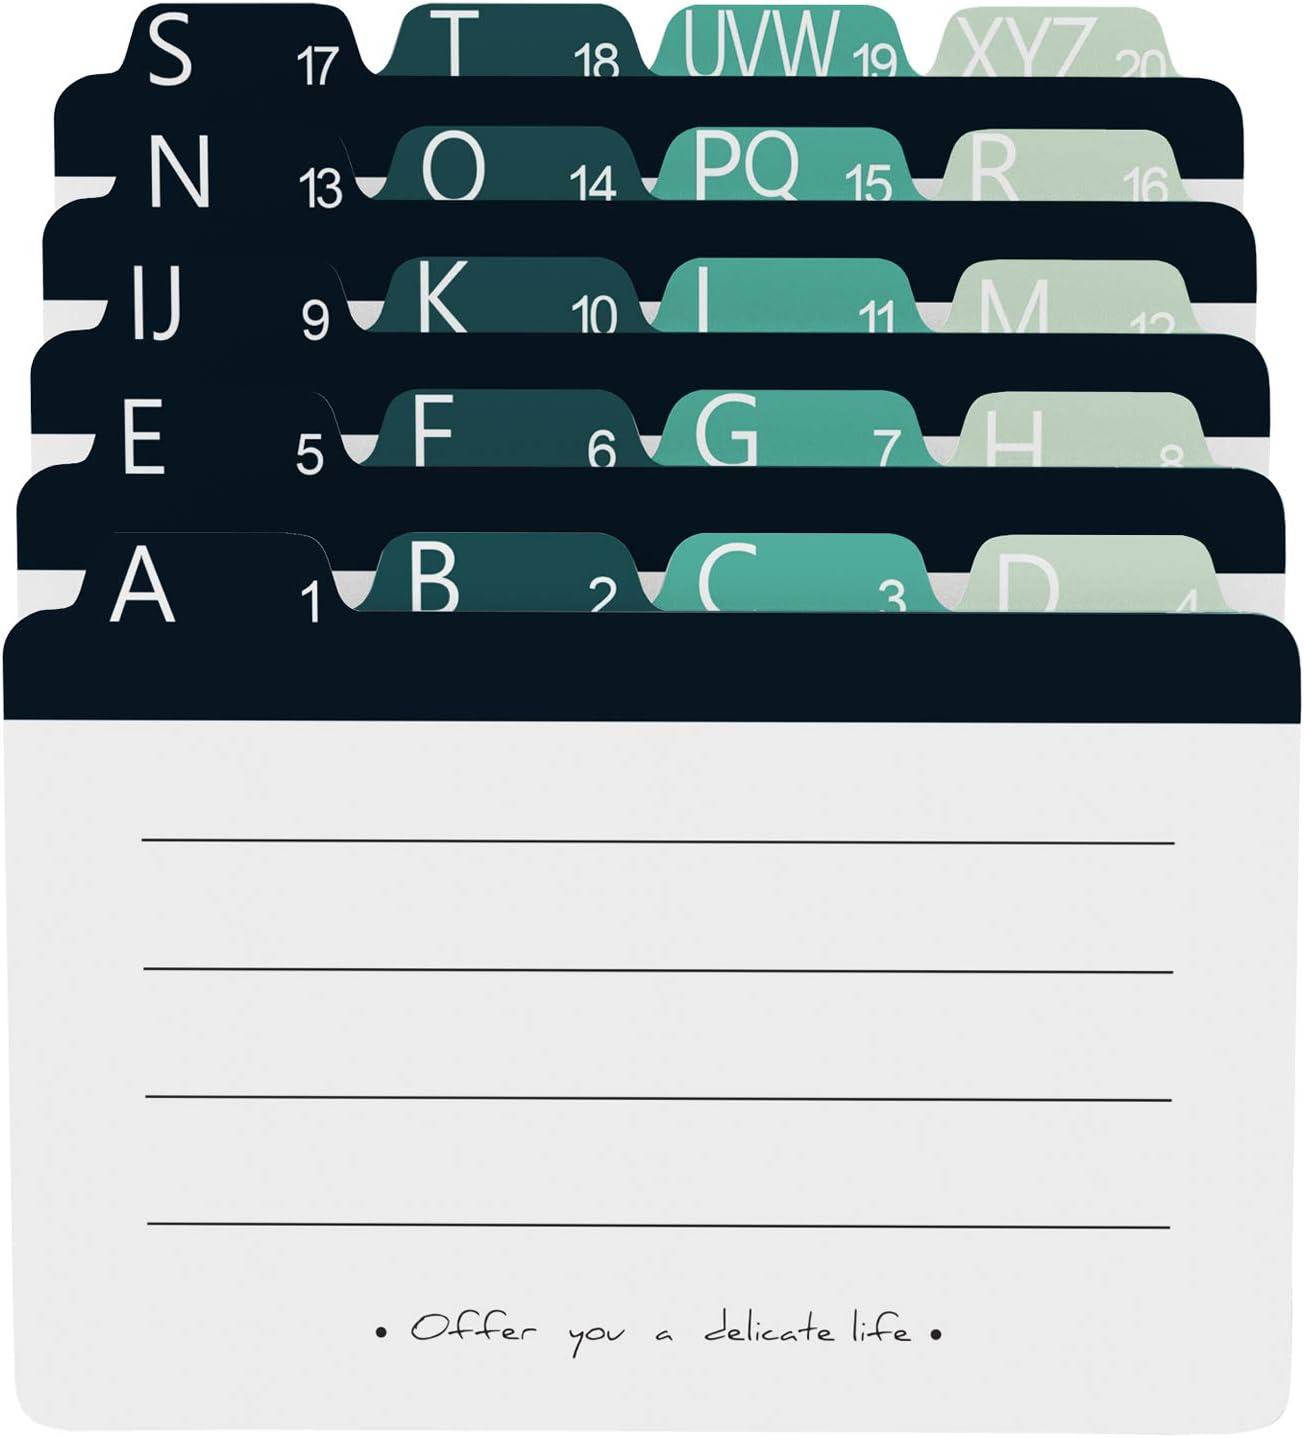 300 dpi. Jpeg Format 2 Zip Files Grunge Index Card Kit 2 Kit includes 20-8 x 5 index cards